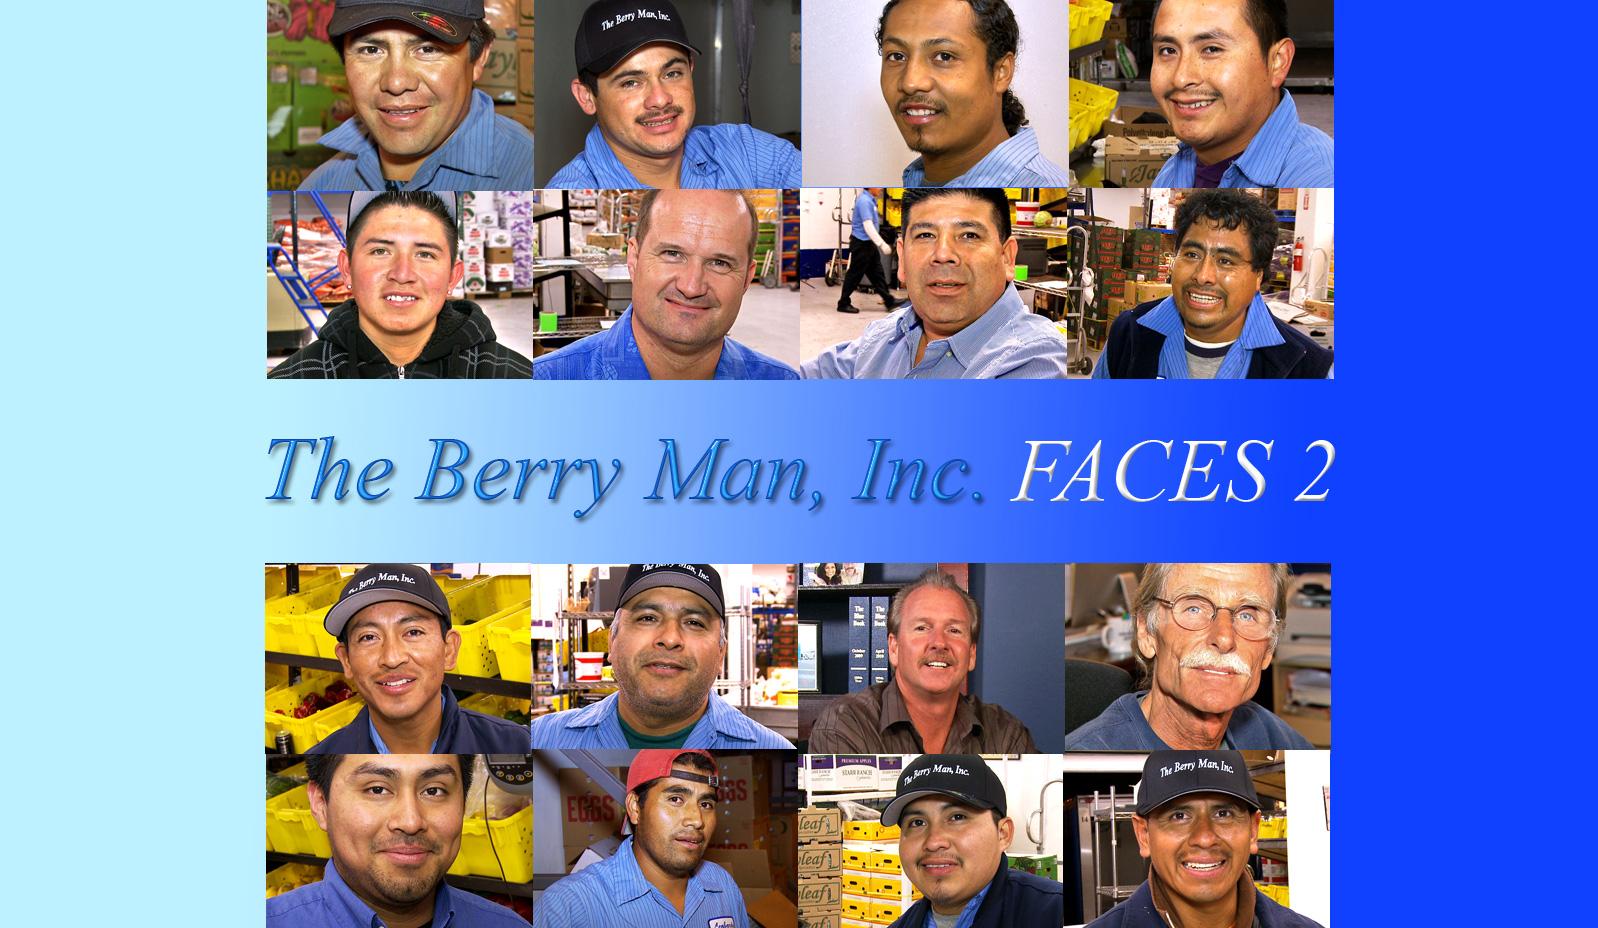 The Berry Man, Inc, June 2013. A 805 Production. Santa Barbara 2013.